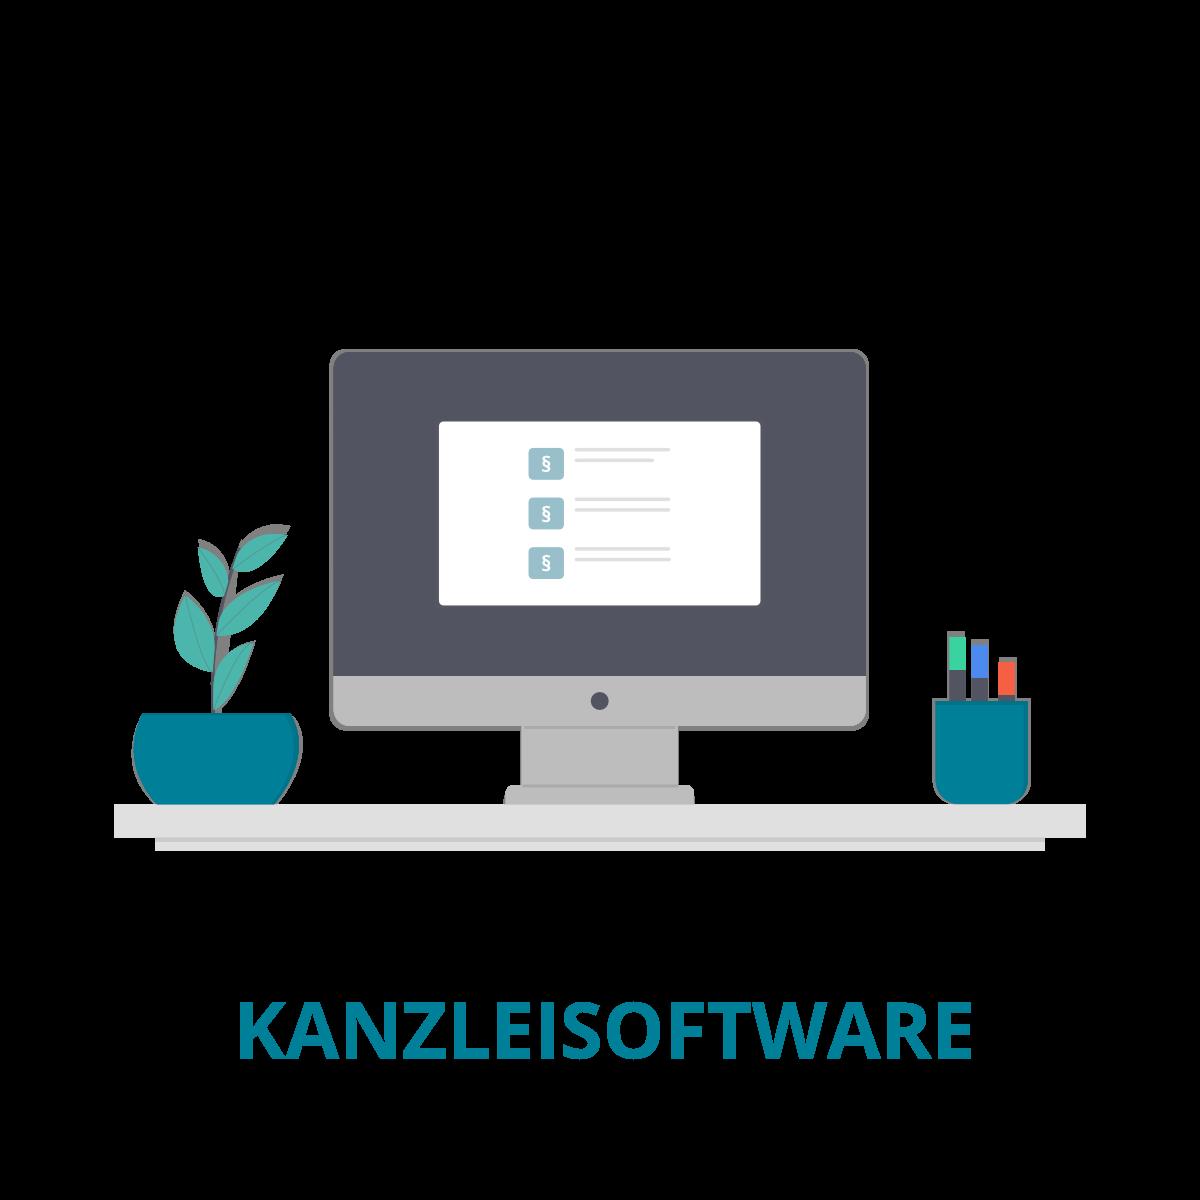 JurCase Kanzleisoftware